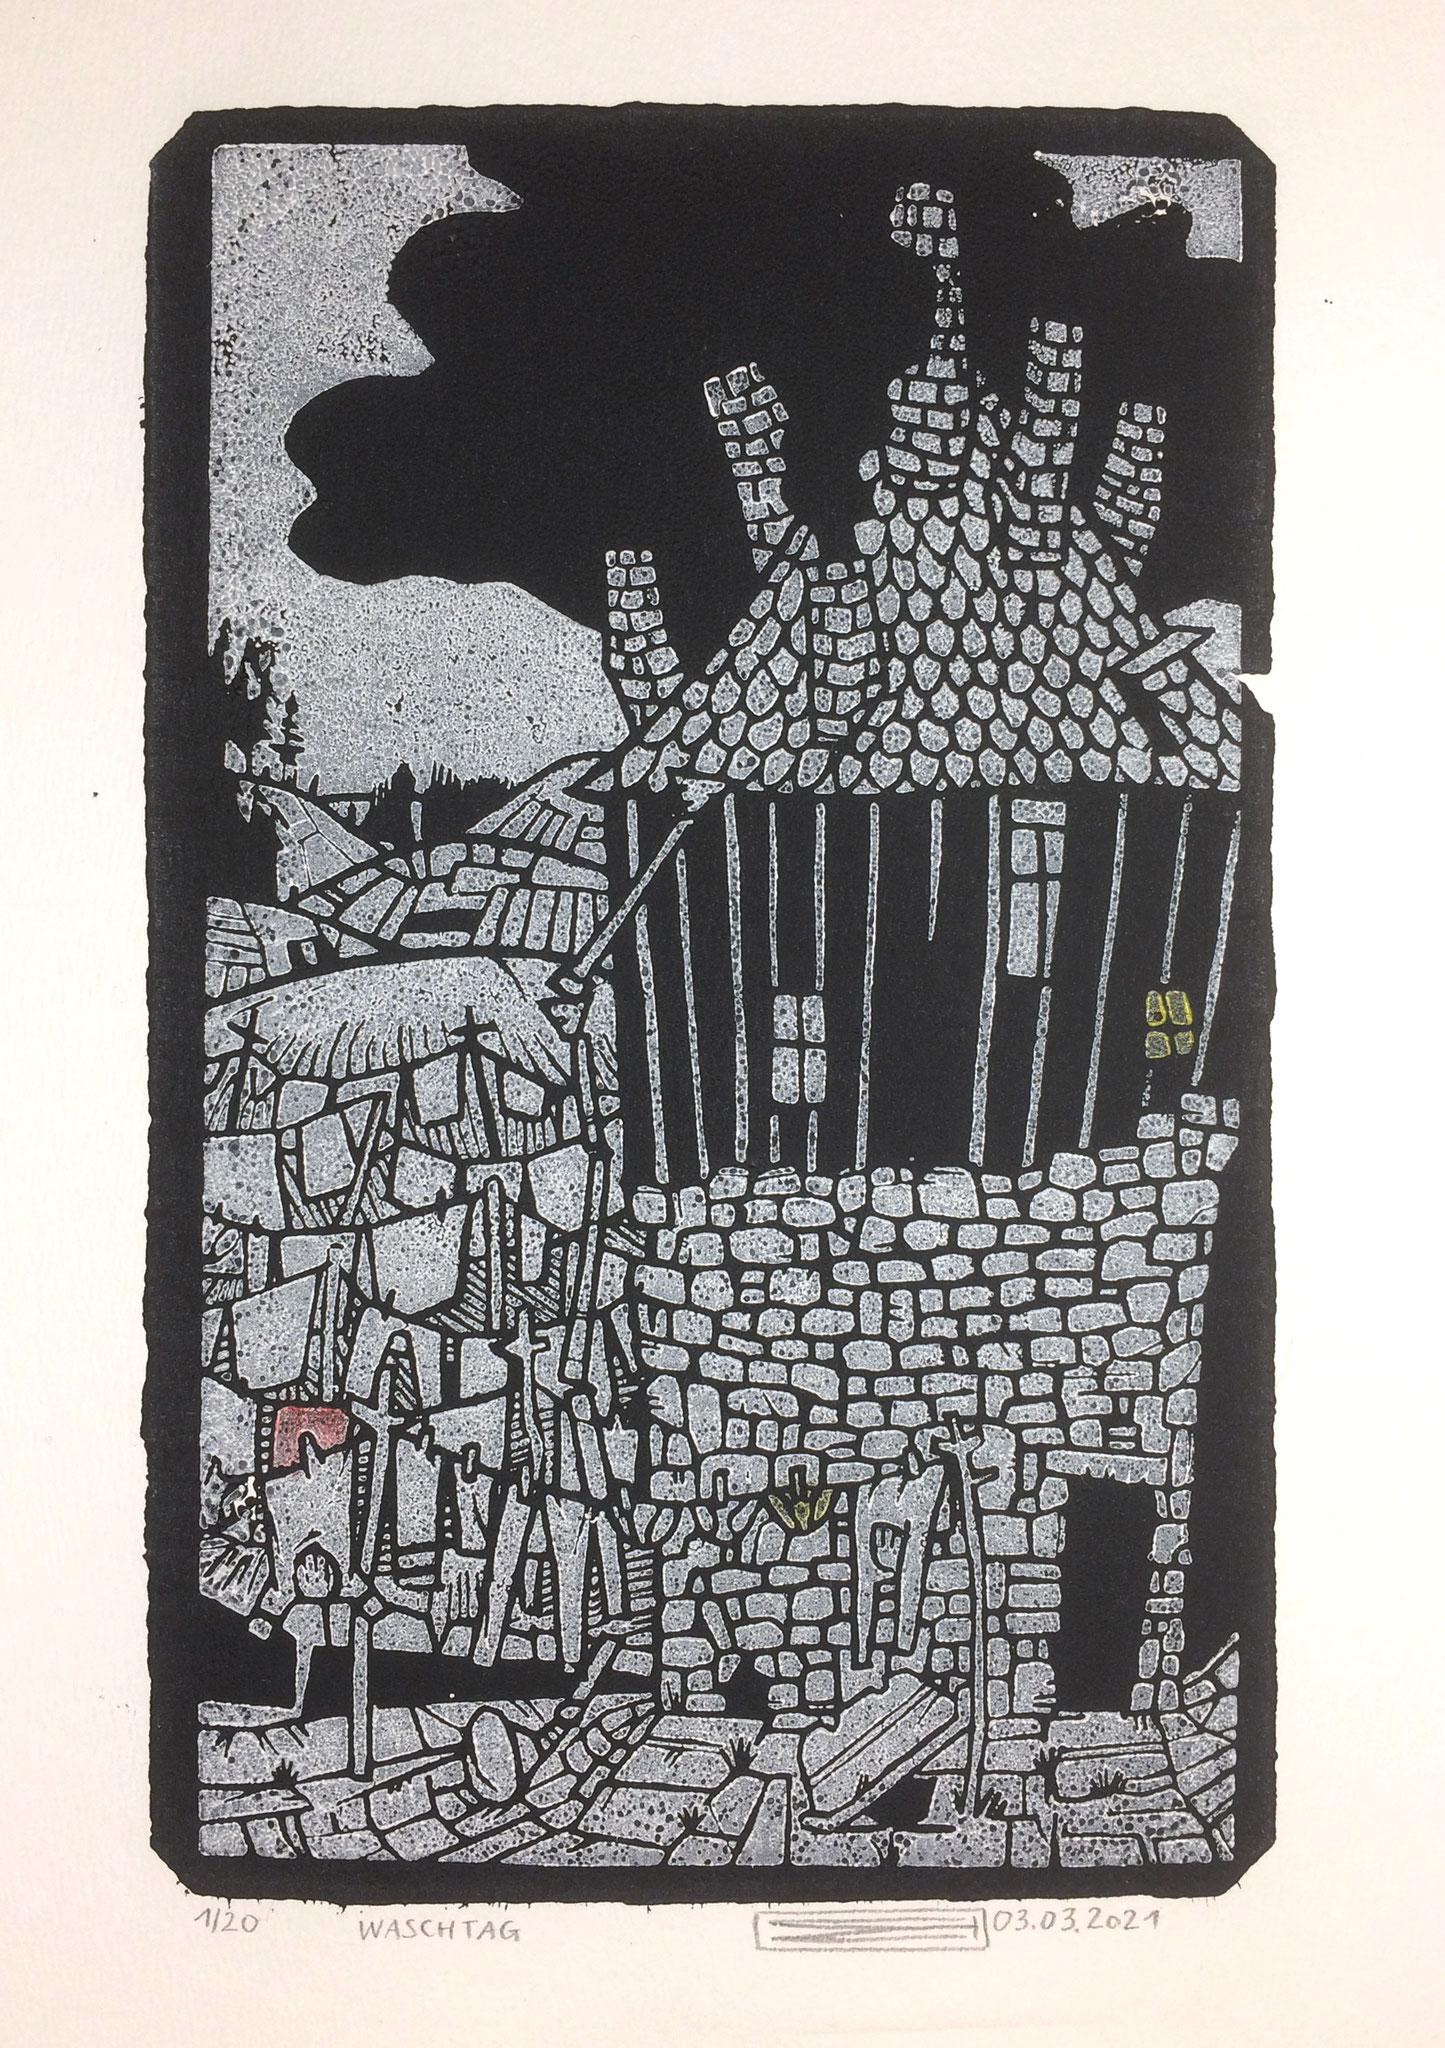 Waschtag, Linoldruck, 13 x 21 cm